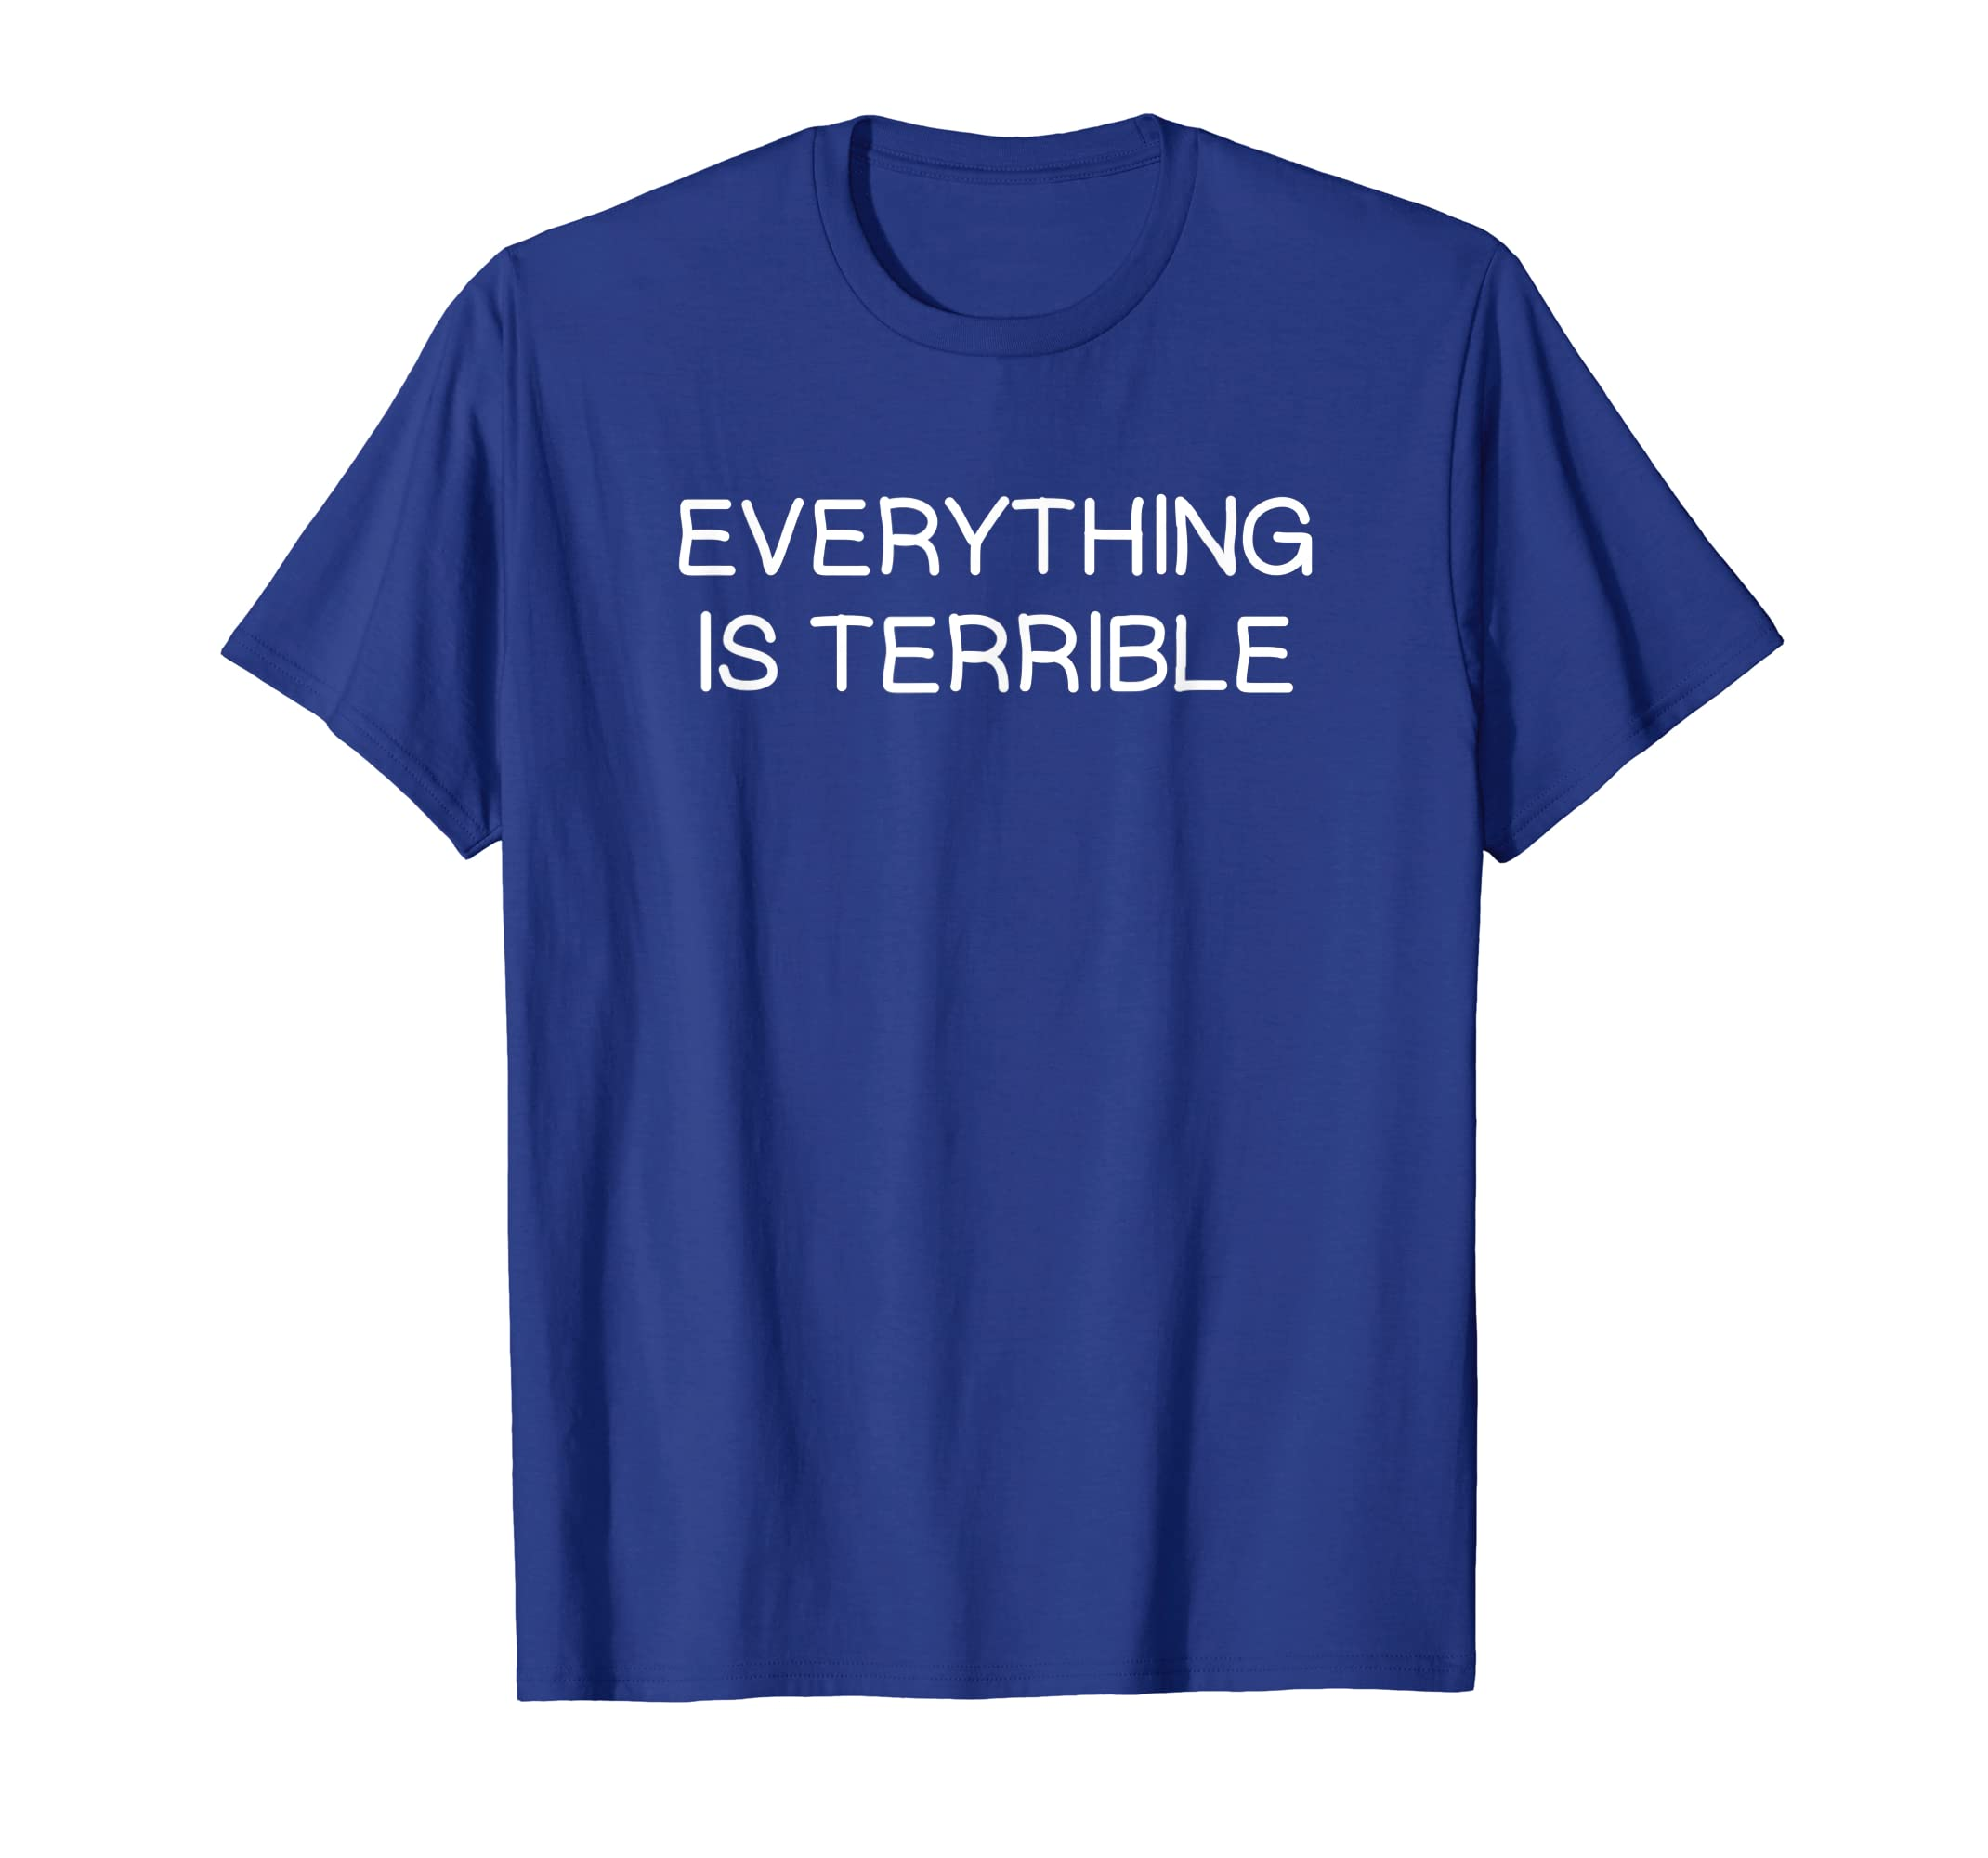 2b7f54c0 Amazon.com: Funny, Everything Is Terrible T-shirt. Sarcastic Joke Tee:  Clothing